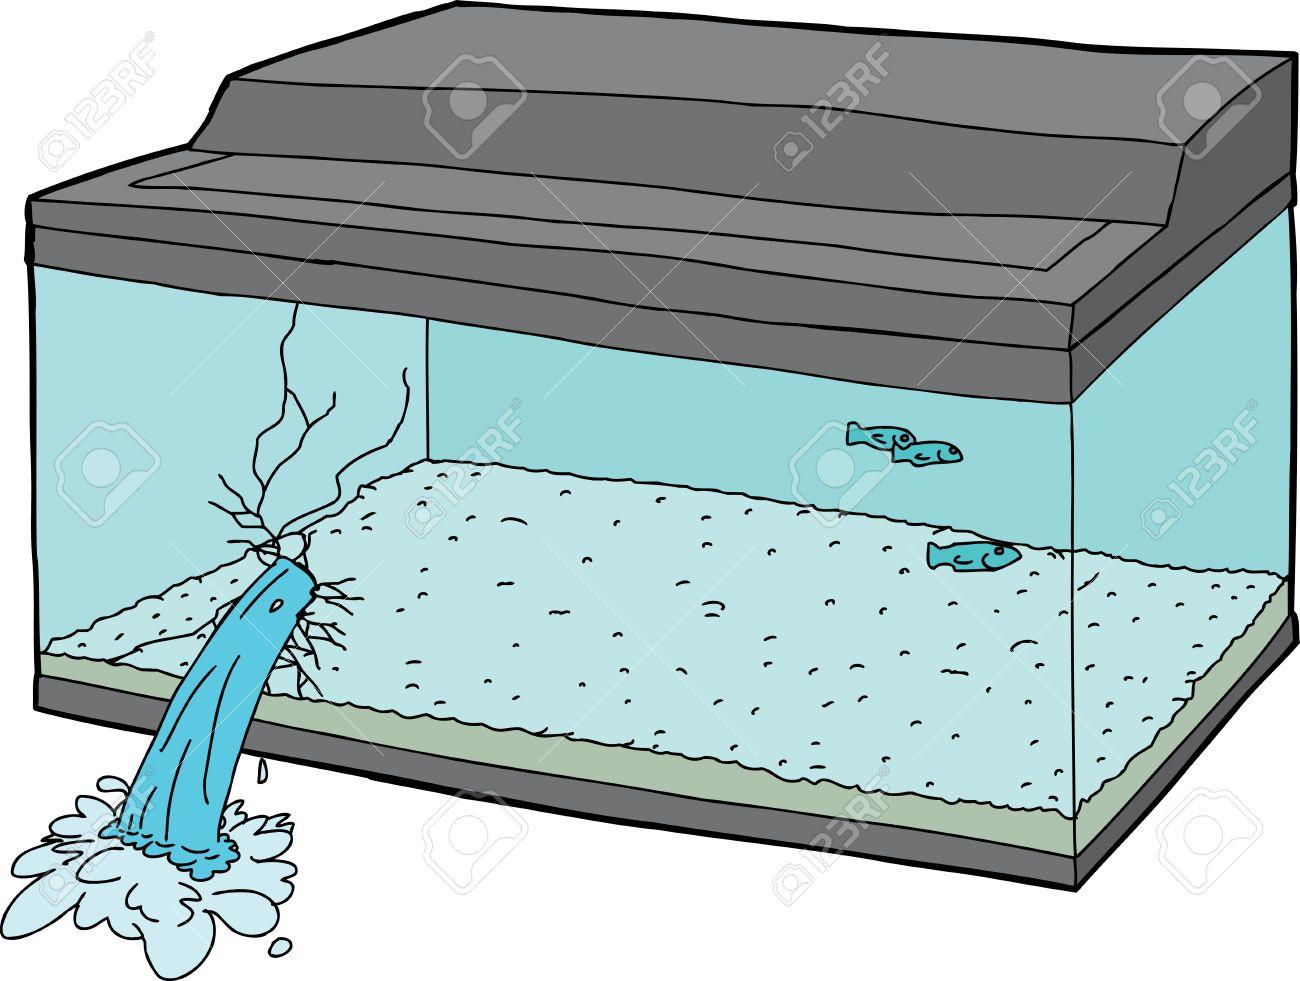 Fish tank clipart - Single Hand Drawn Broken Fish Tank Over White Stock Vector 38824660